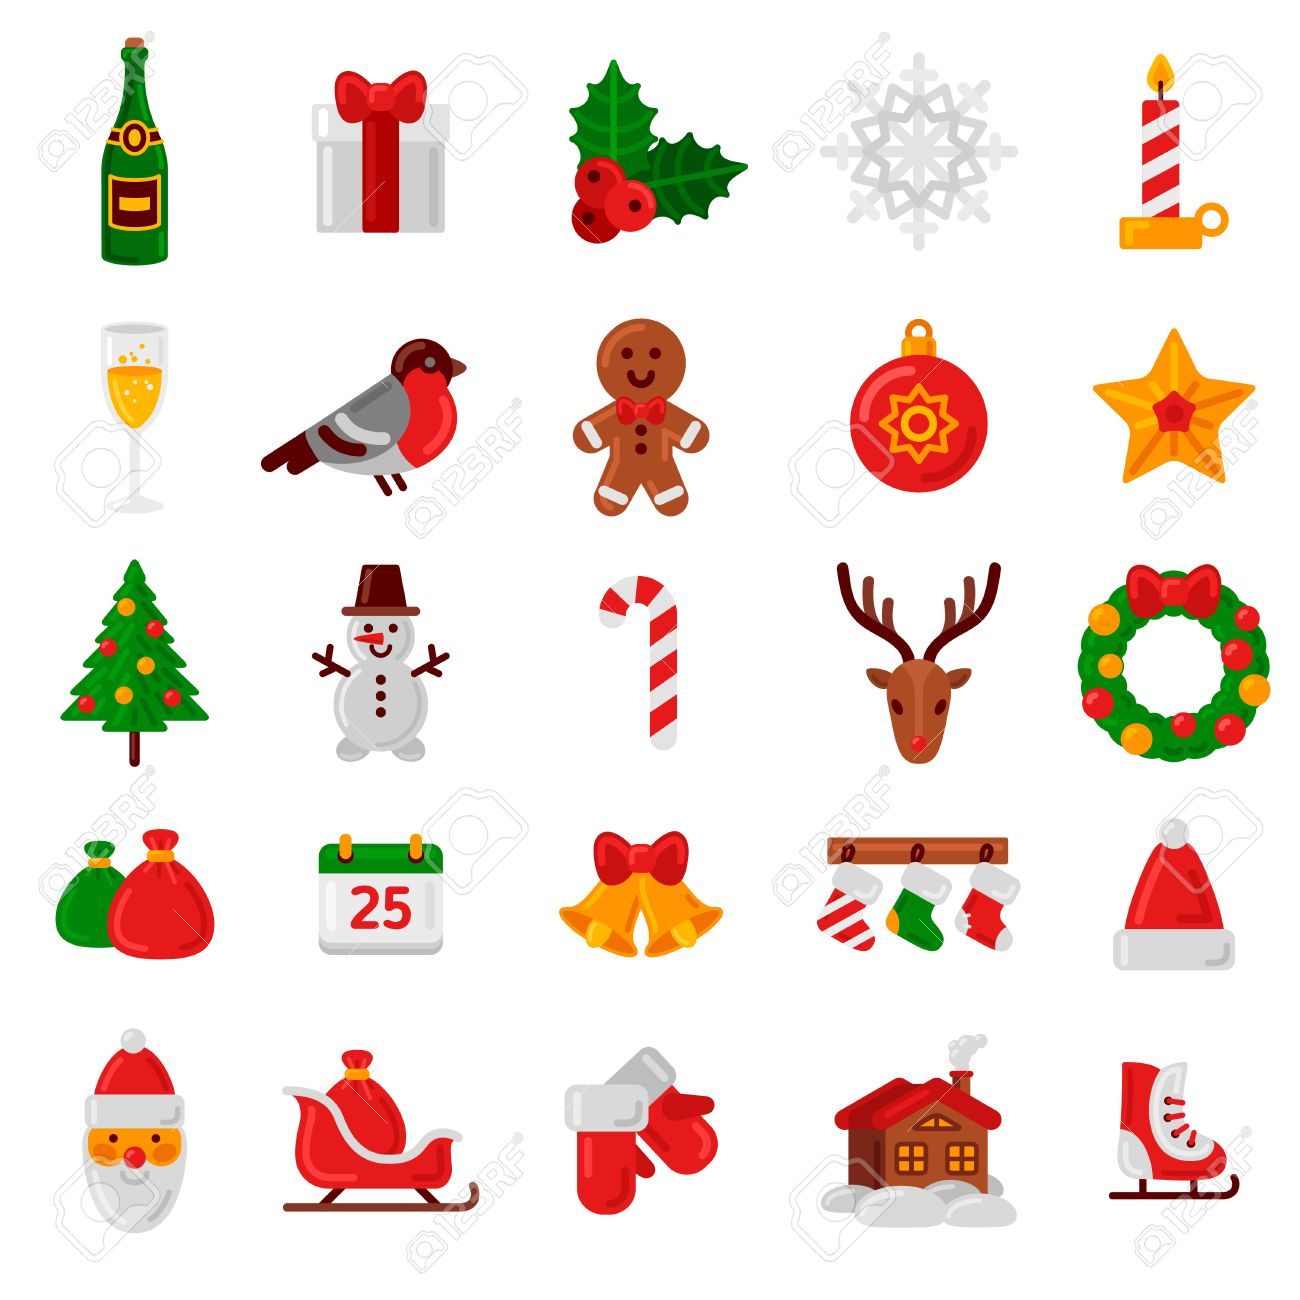 Christmas Set.Set Of Flat Christmas Icons Vector Illustration Holiday Signs